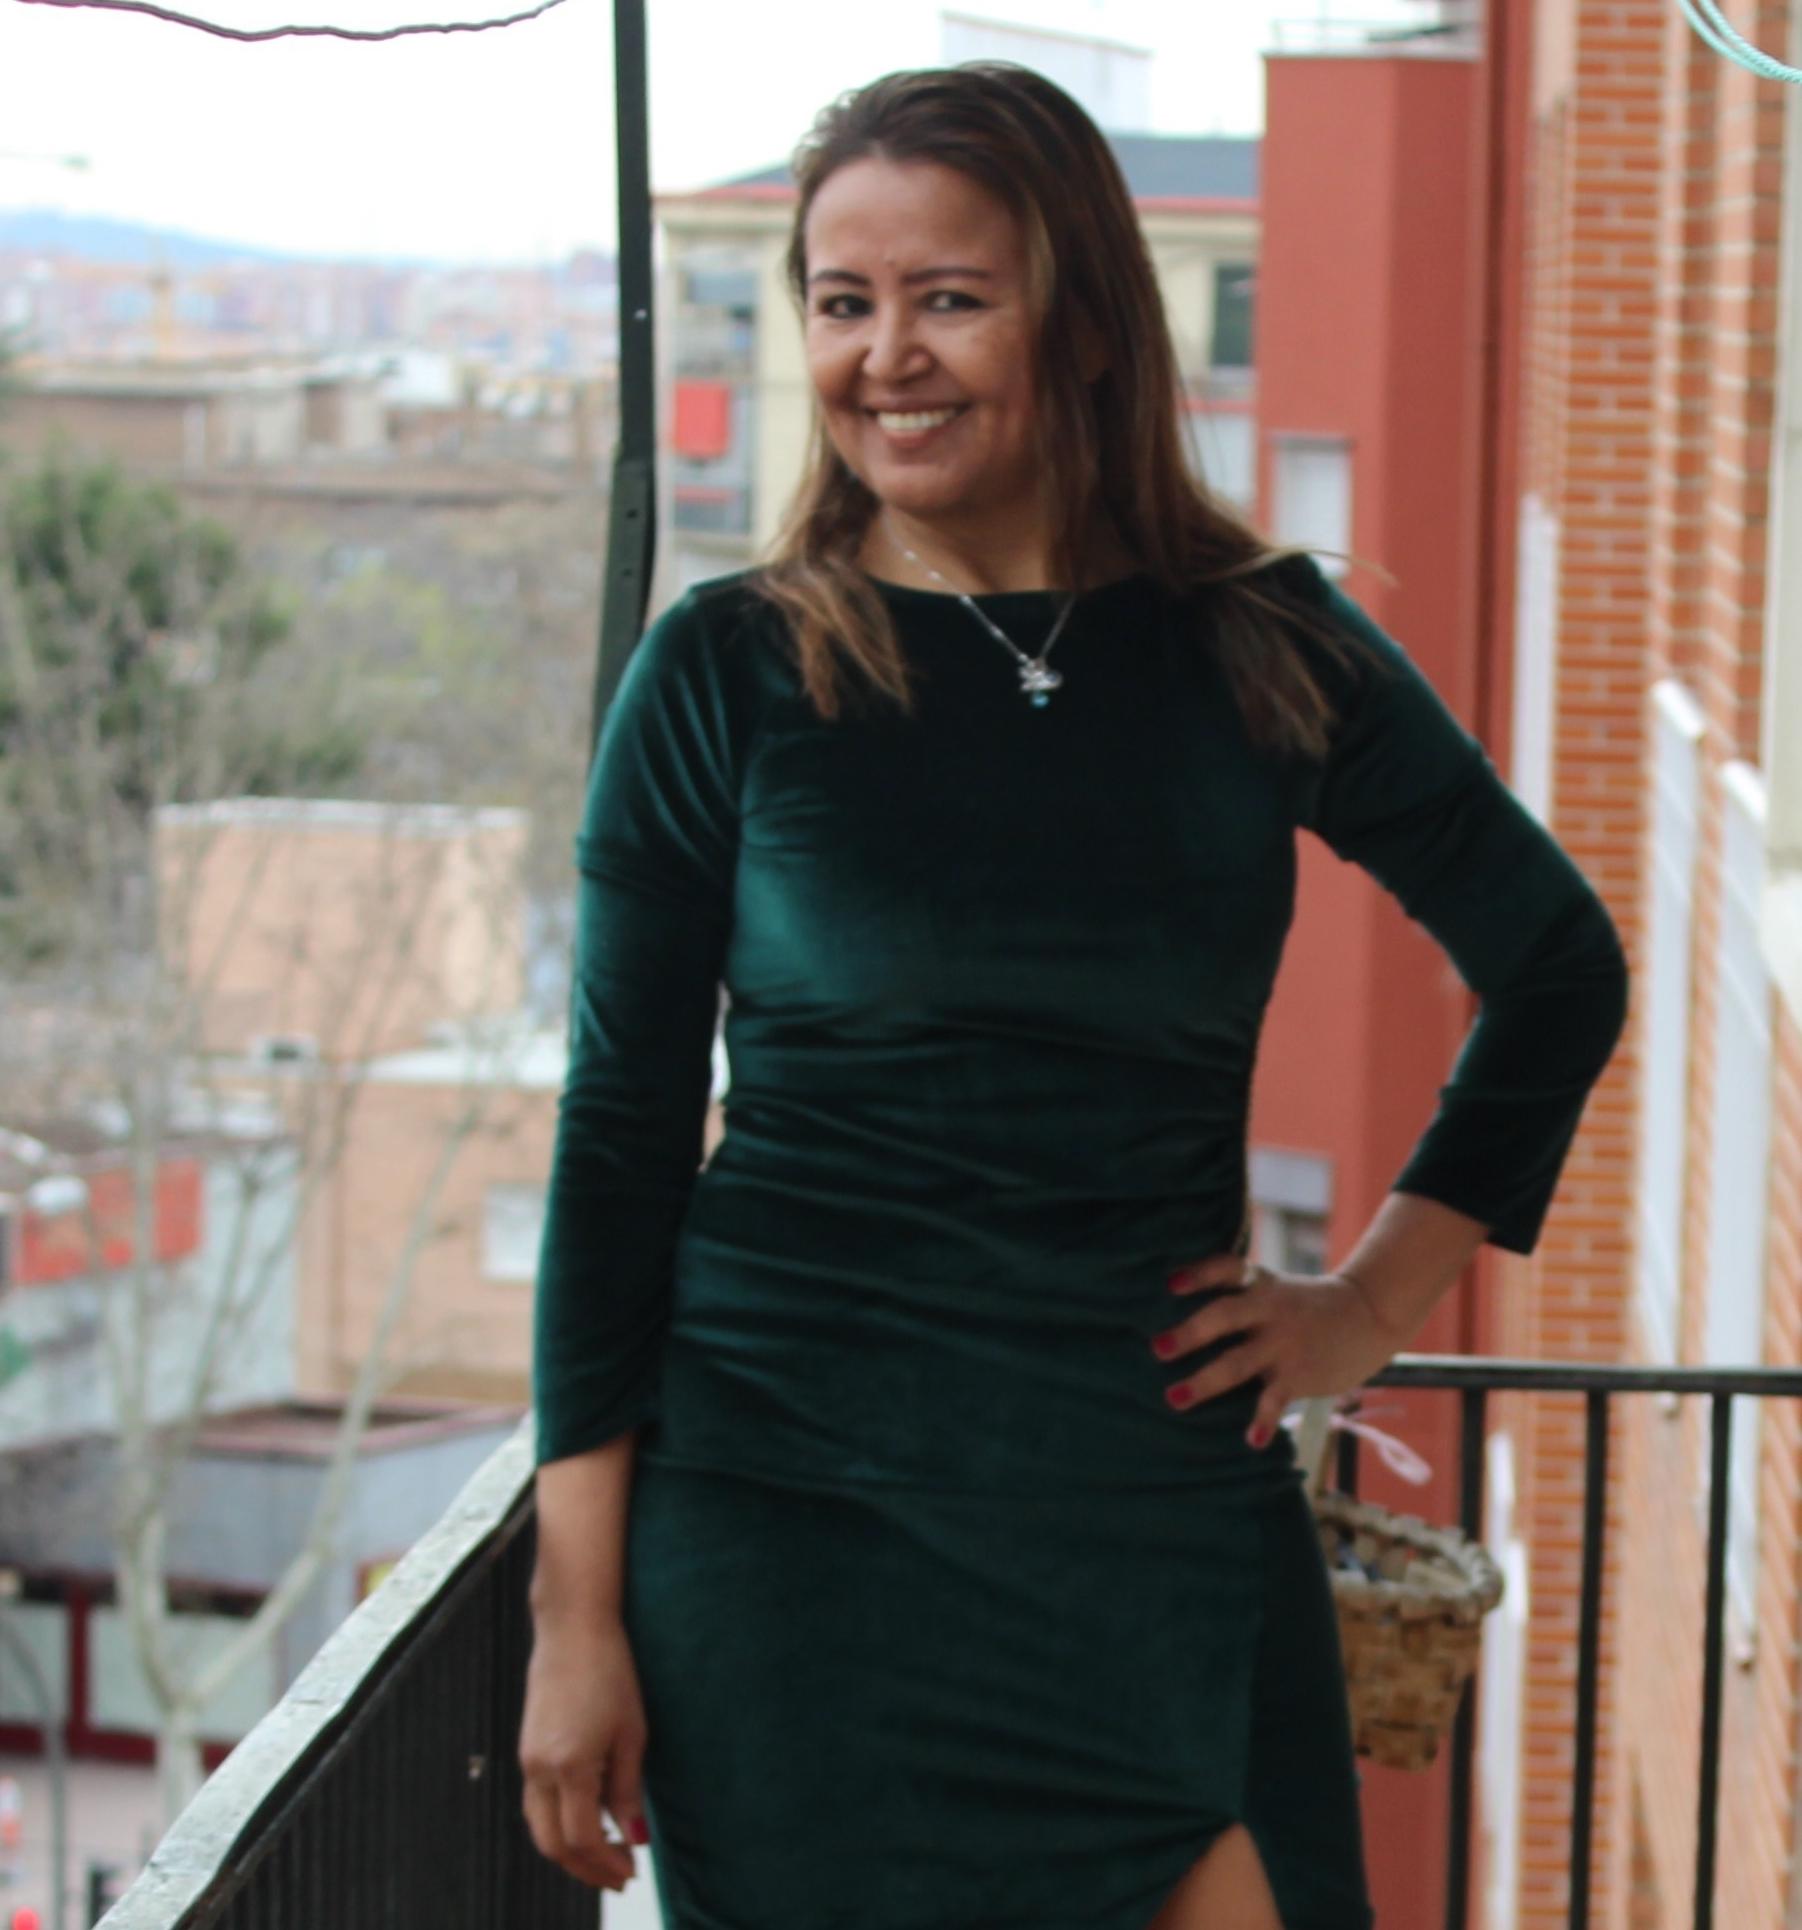 Vestido terciopelo verde, manga larga